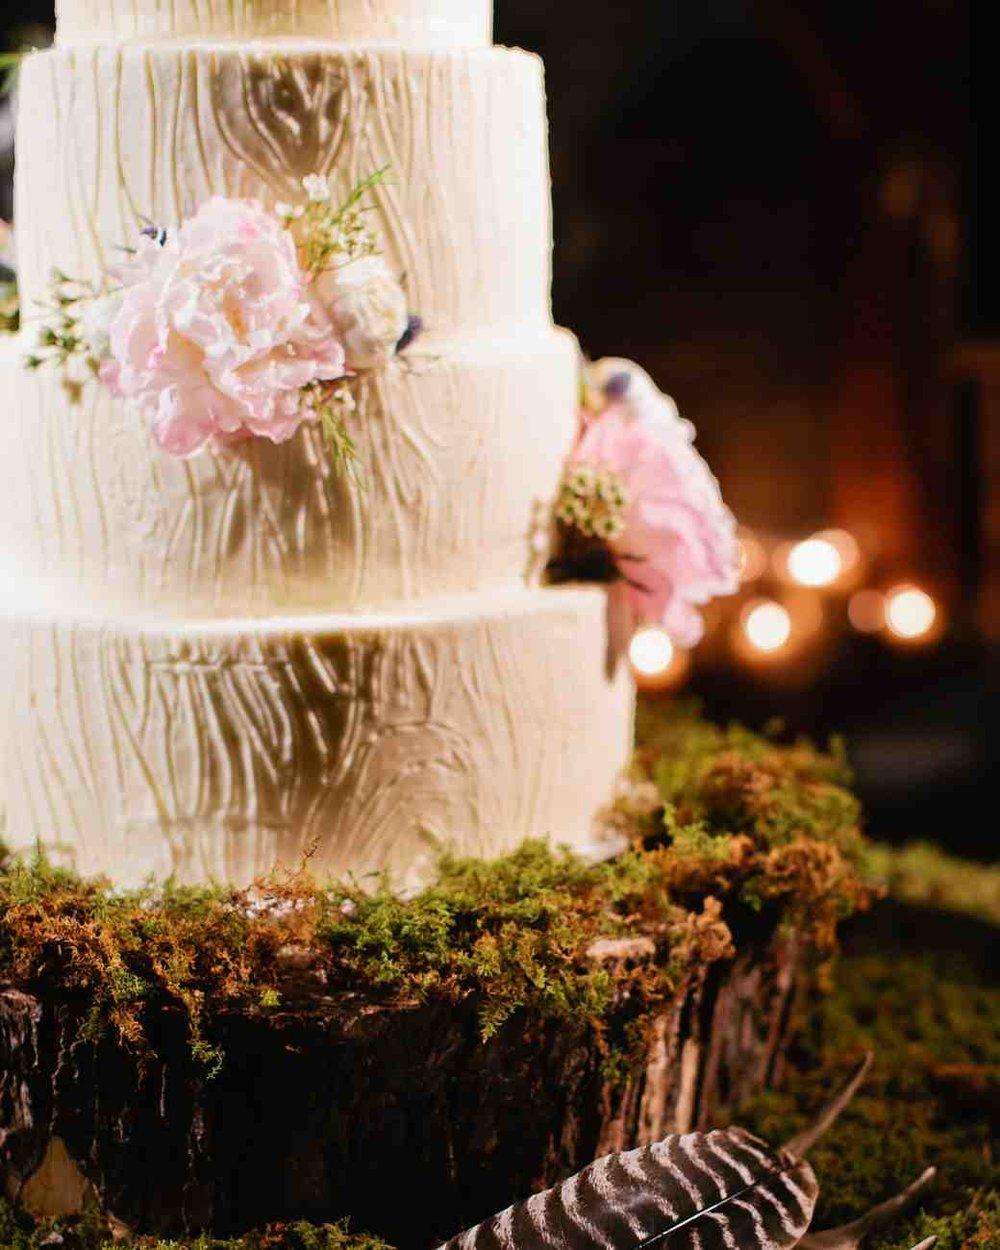 memree-rich-wedding-cake-788-6257086-0217_vert.jpg